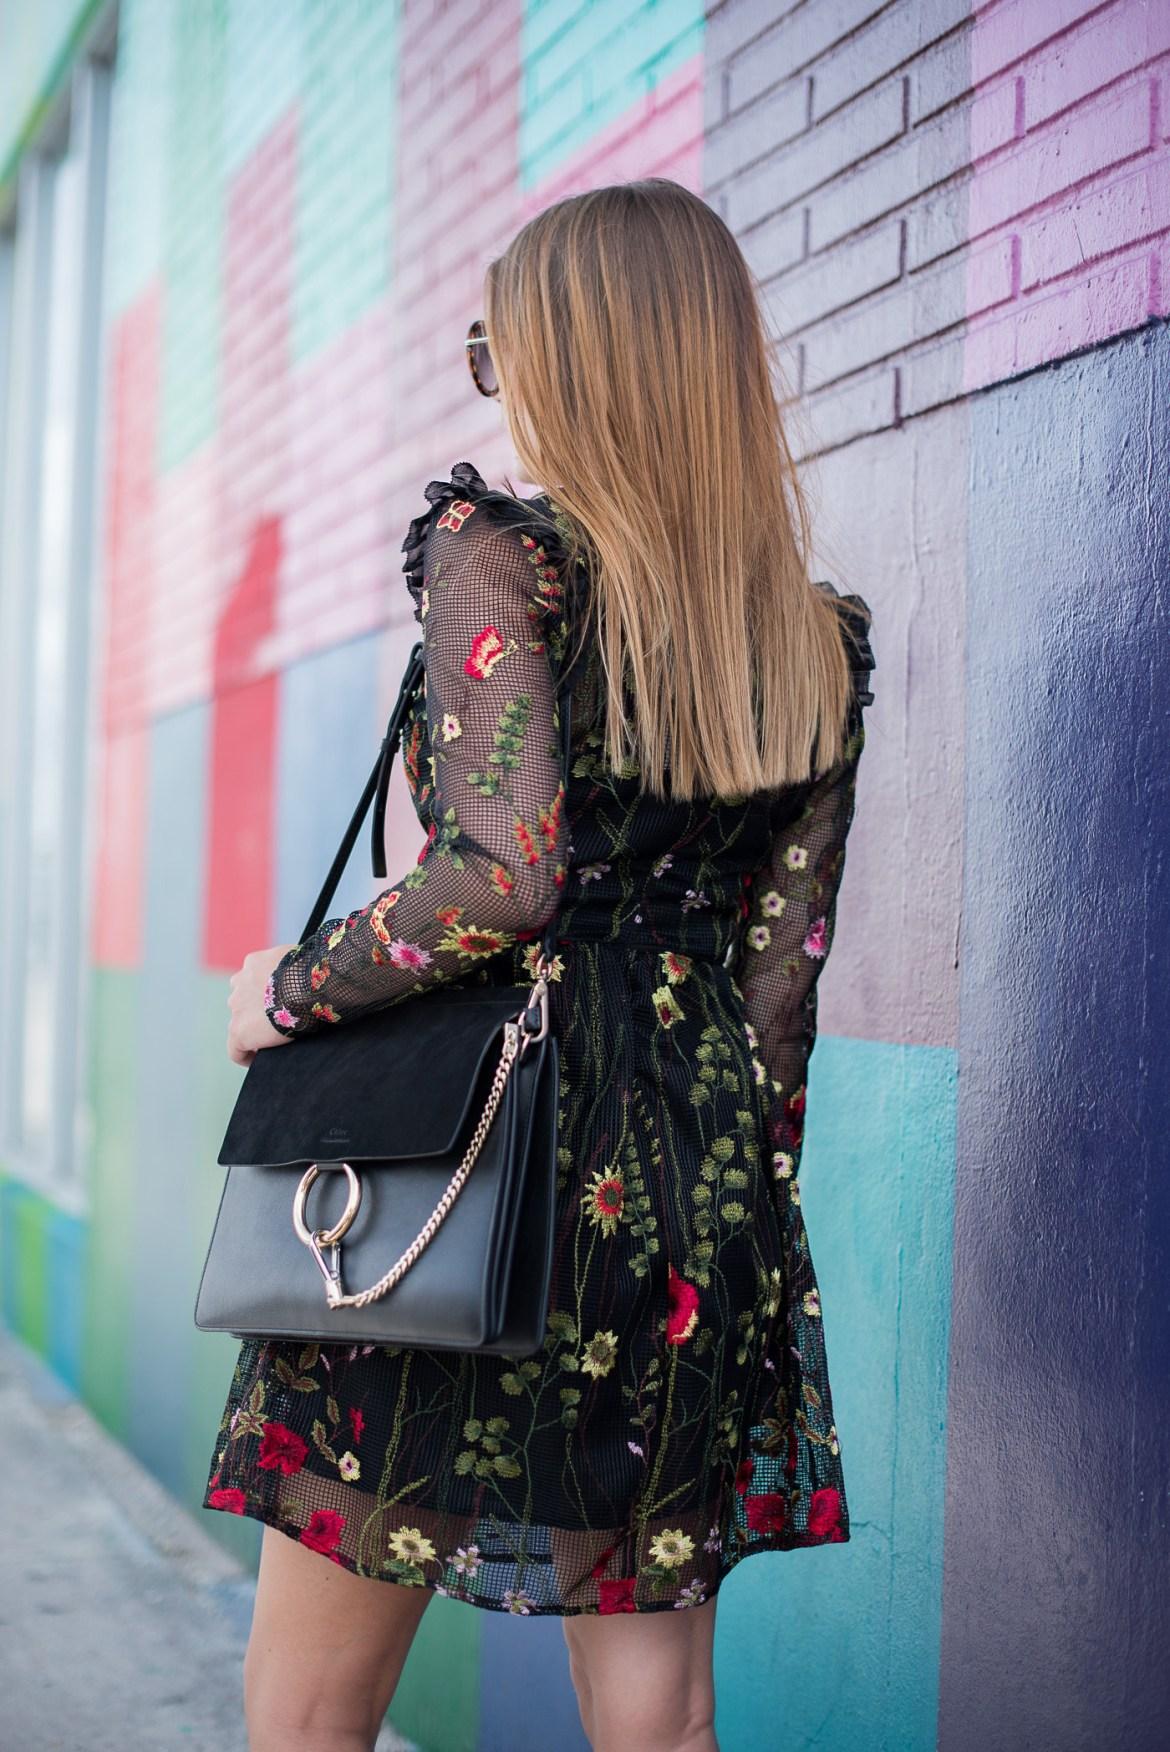 miami_wynwood_walls_flower_print_dress_2